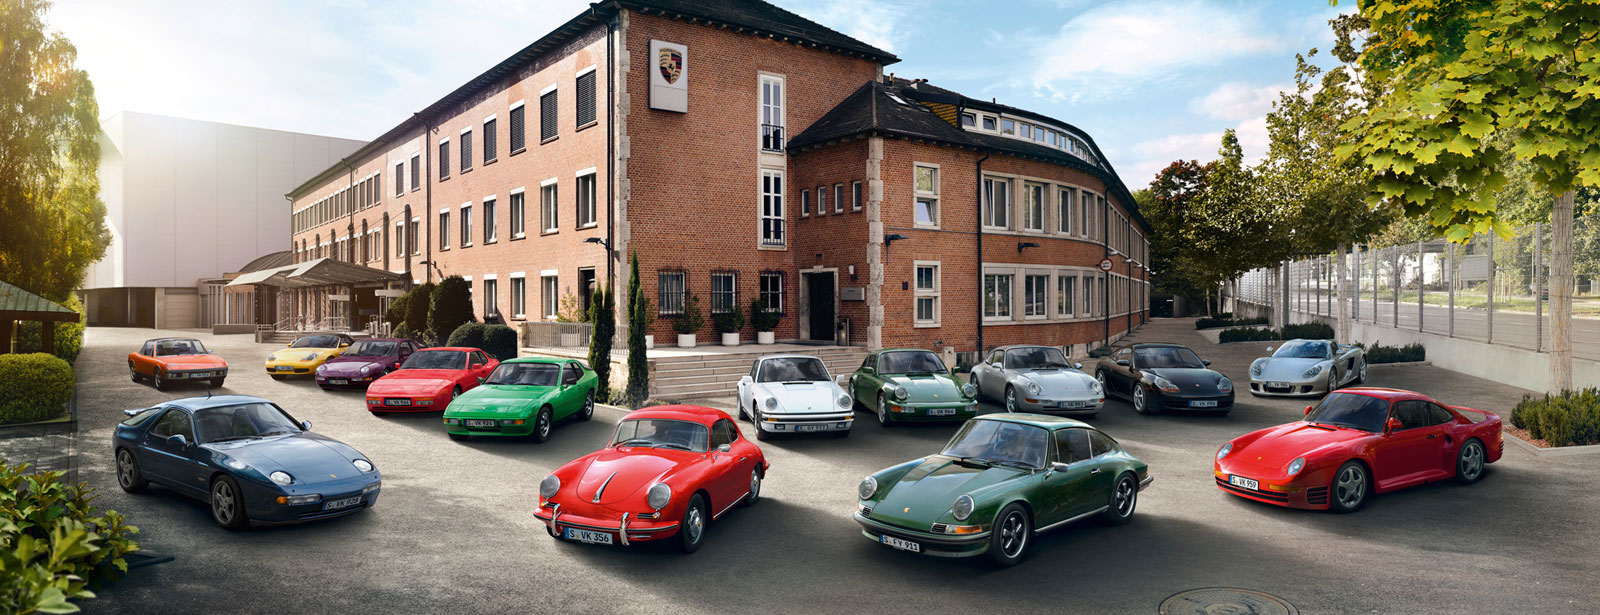 Porsche Classic Partner | Diebstahlschutz